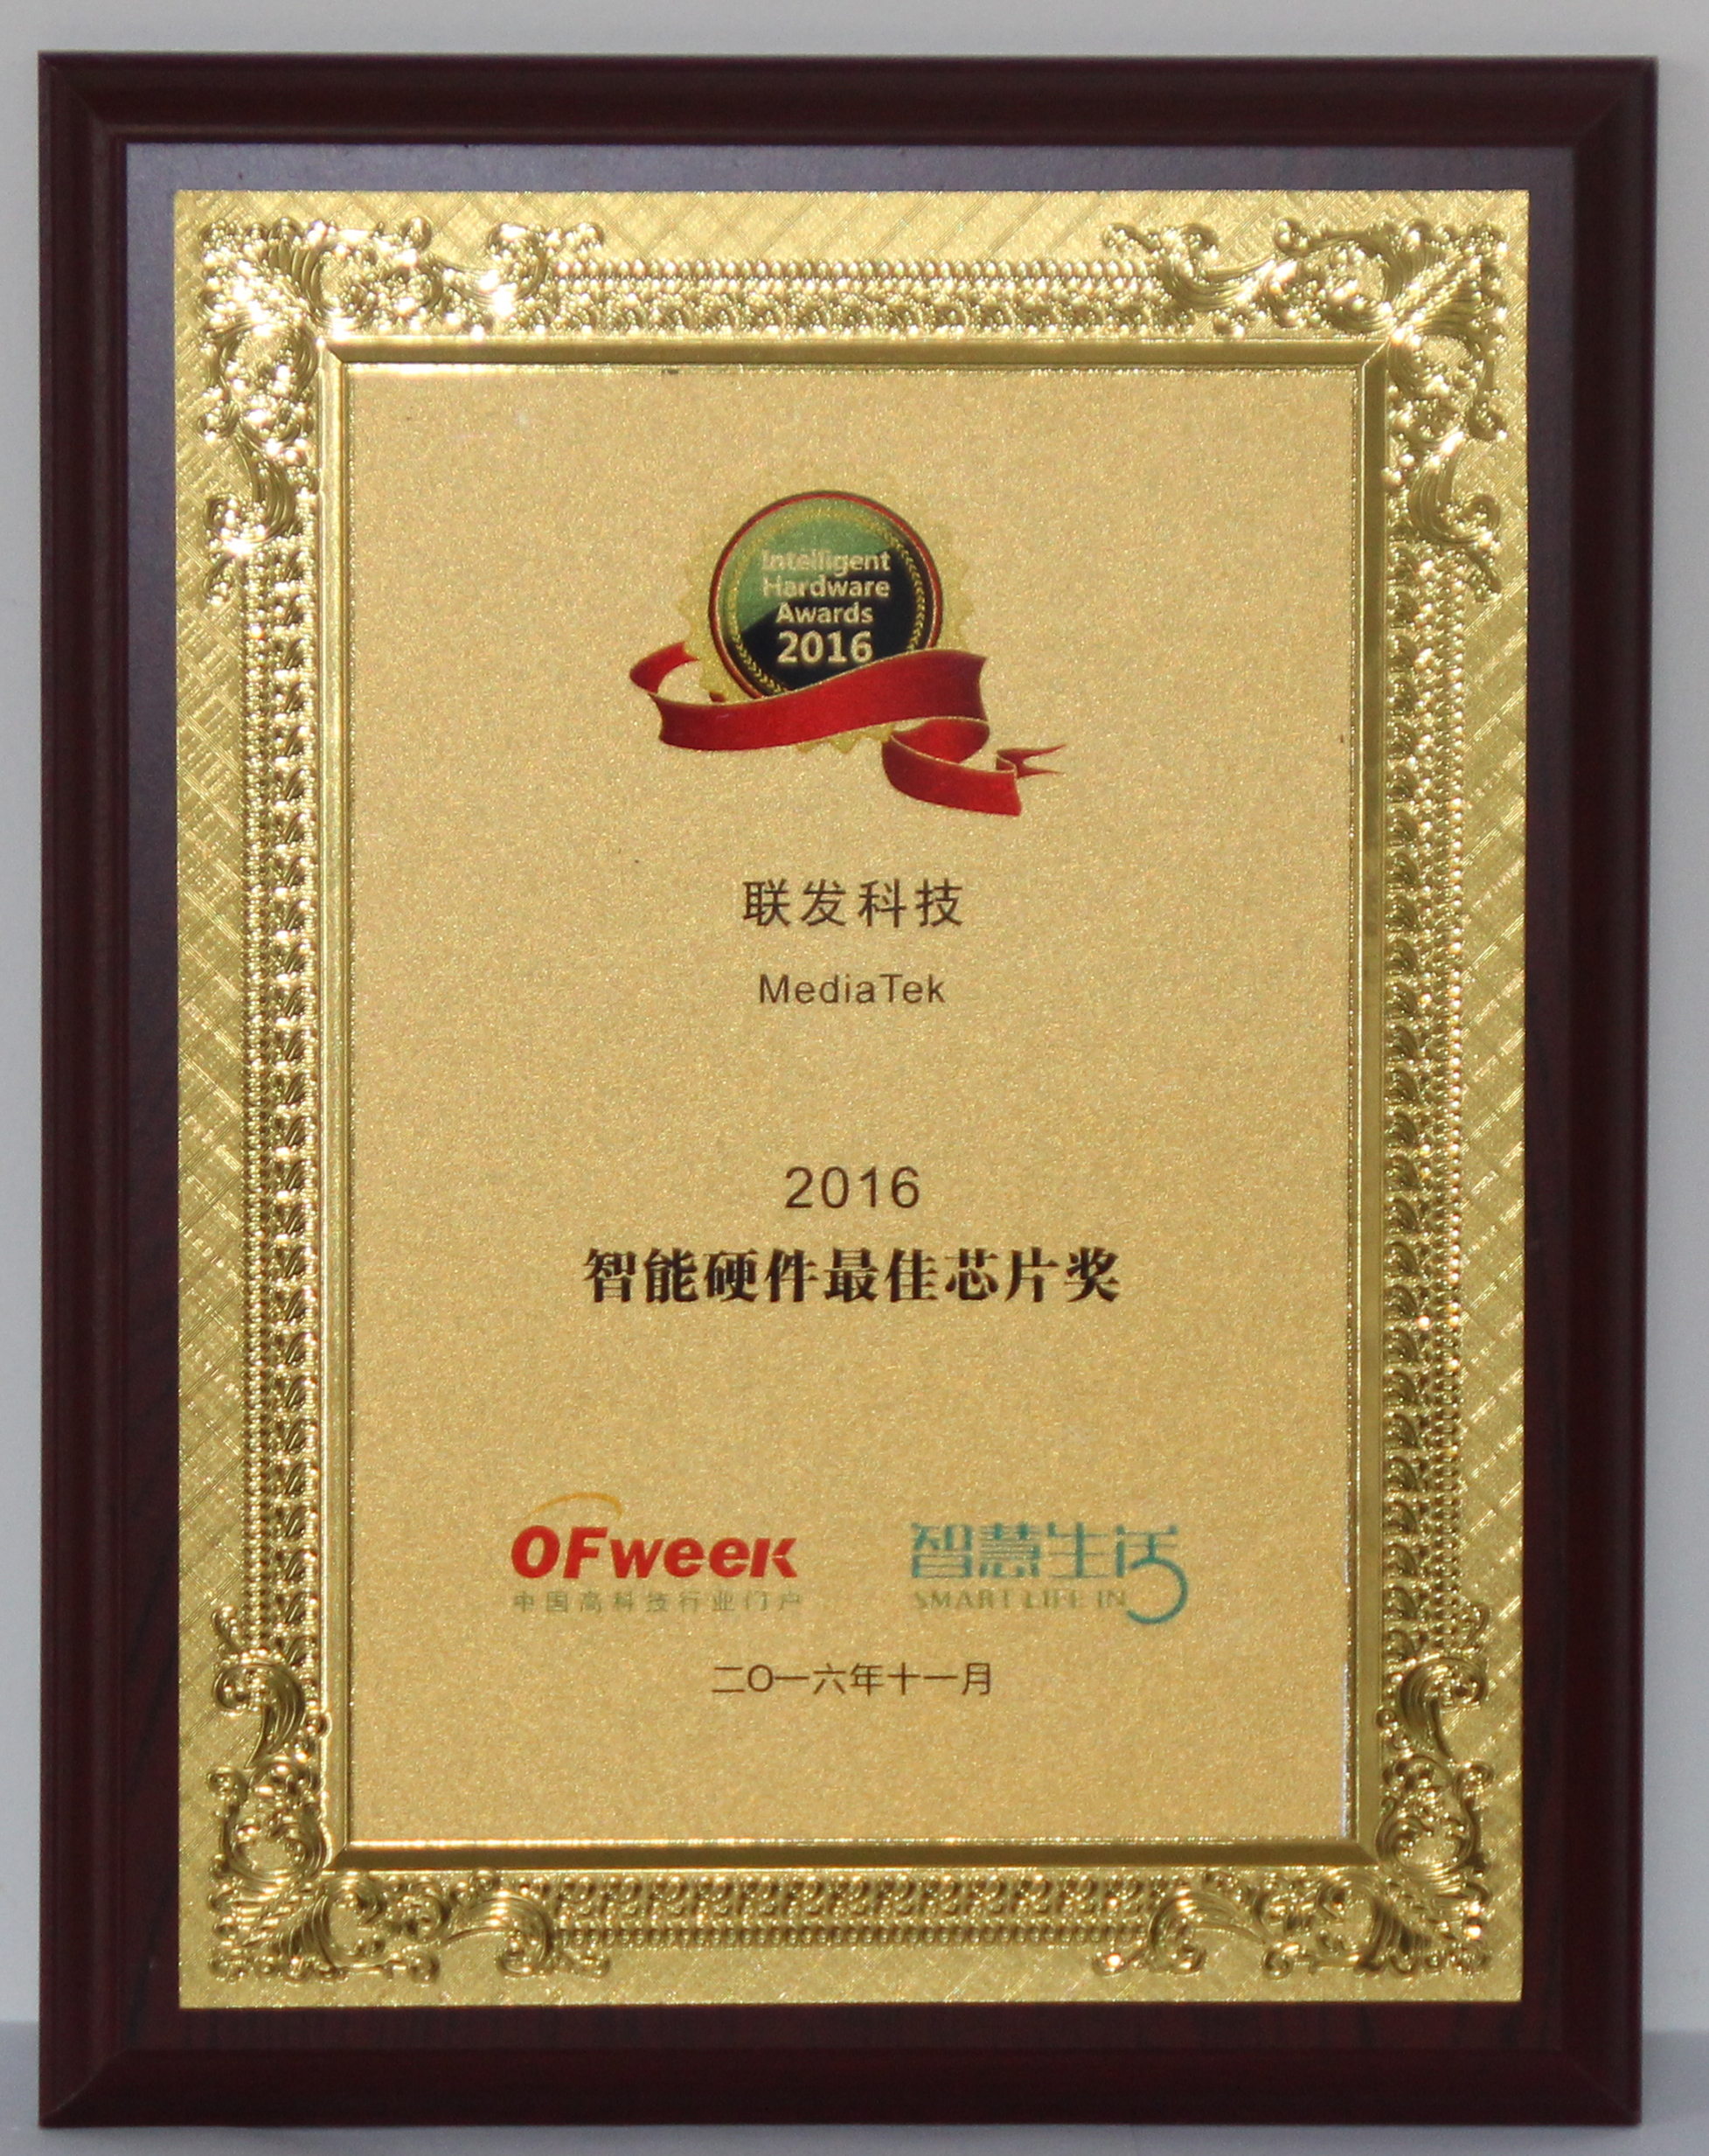 "联发科技获China Intelligent Hardware Awards 2016""智能硬件最佳芯片奖"""